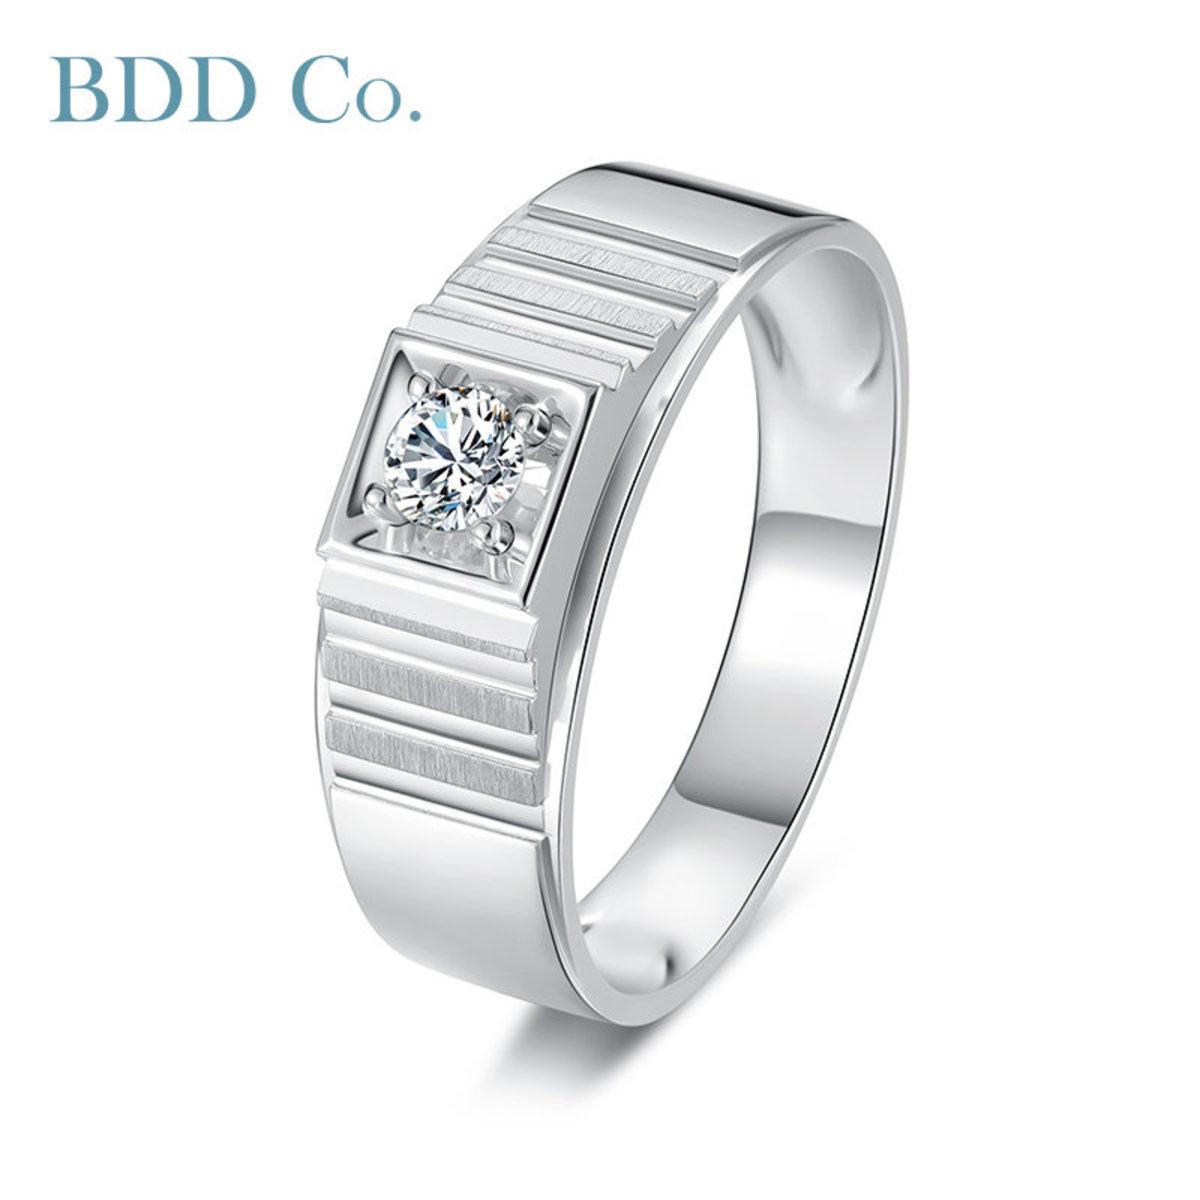 18k White Gold Classic Band Diamond Ring (0.15 ct. tw.)